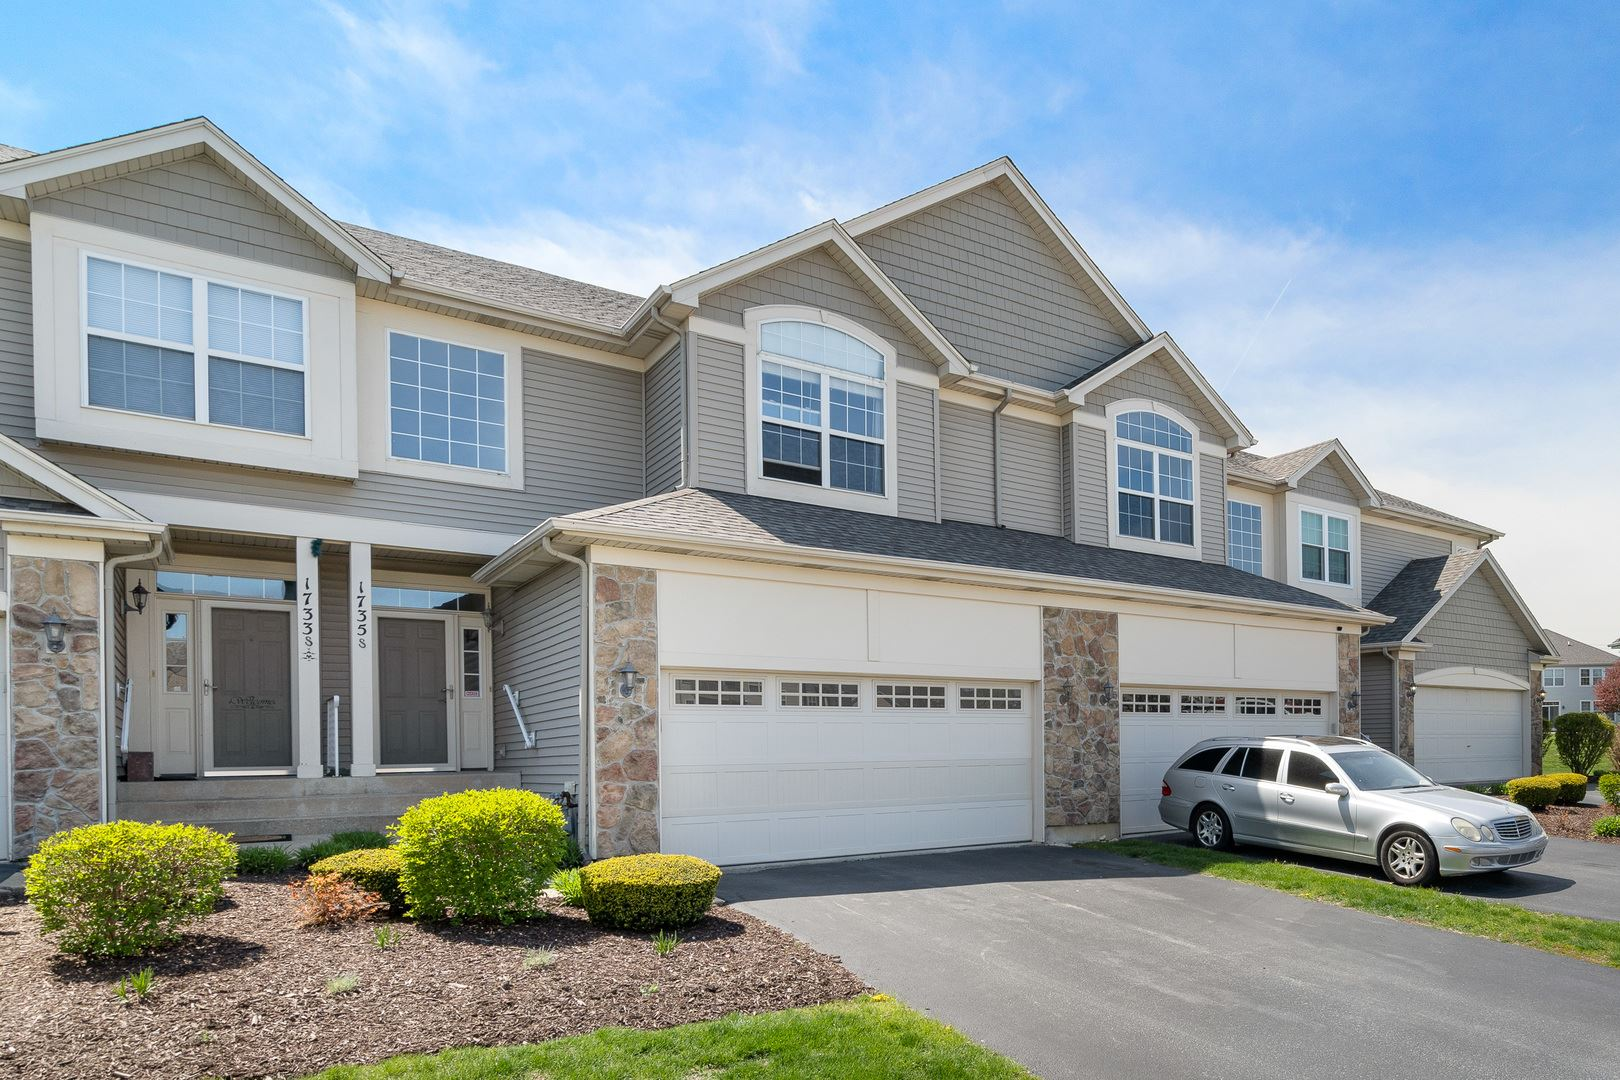 Photo of 1735 Fieldstone Drive S, Shorewood, IL 60404 (MLS # 11057081)